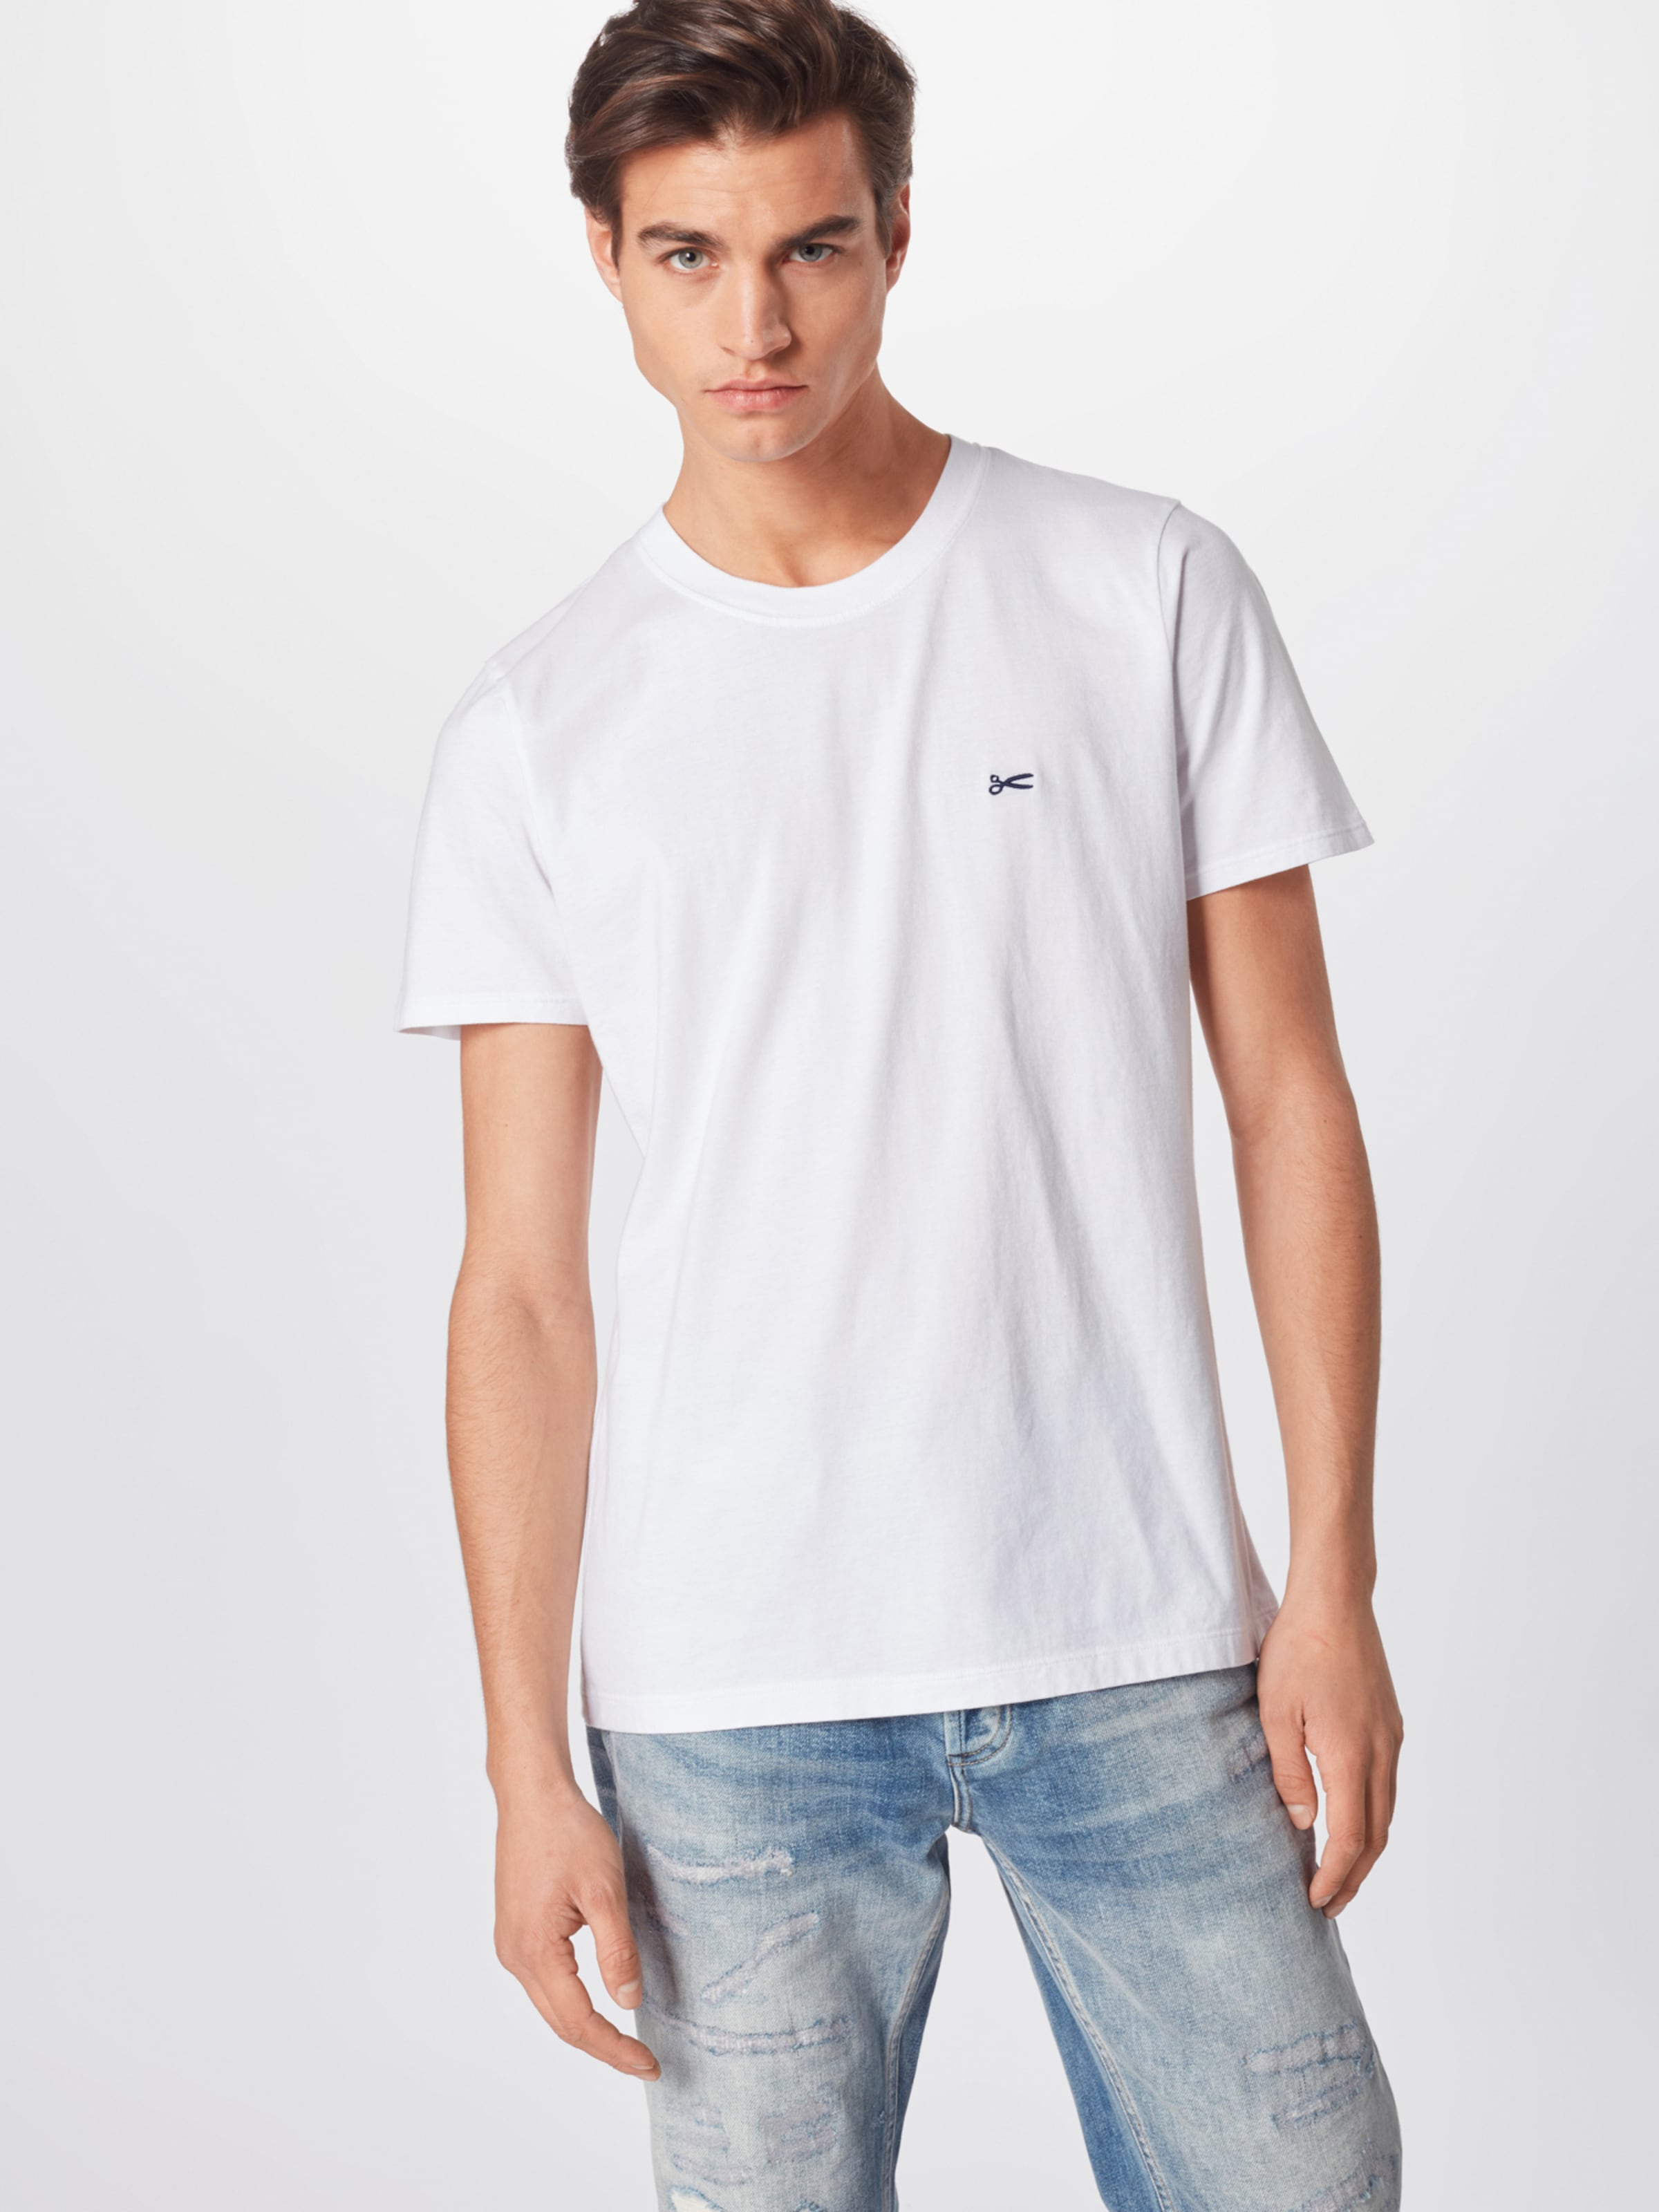 'crew Tee Moj' Denham Shirt In Weiß cl1FKJ3T